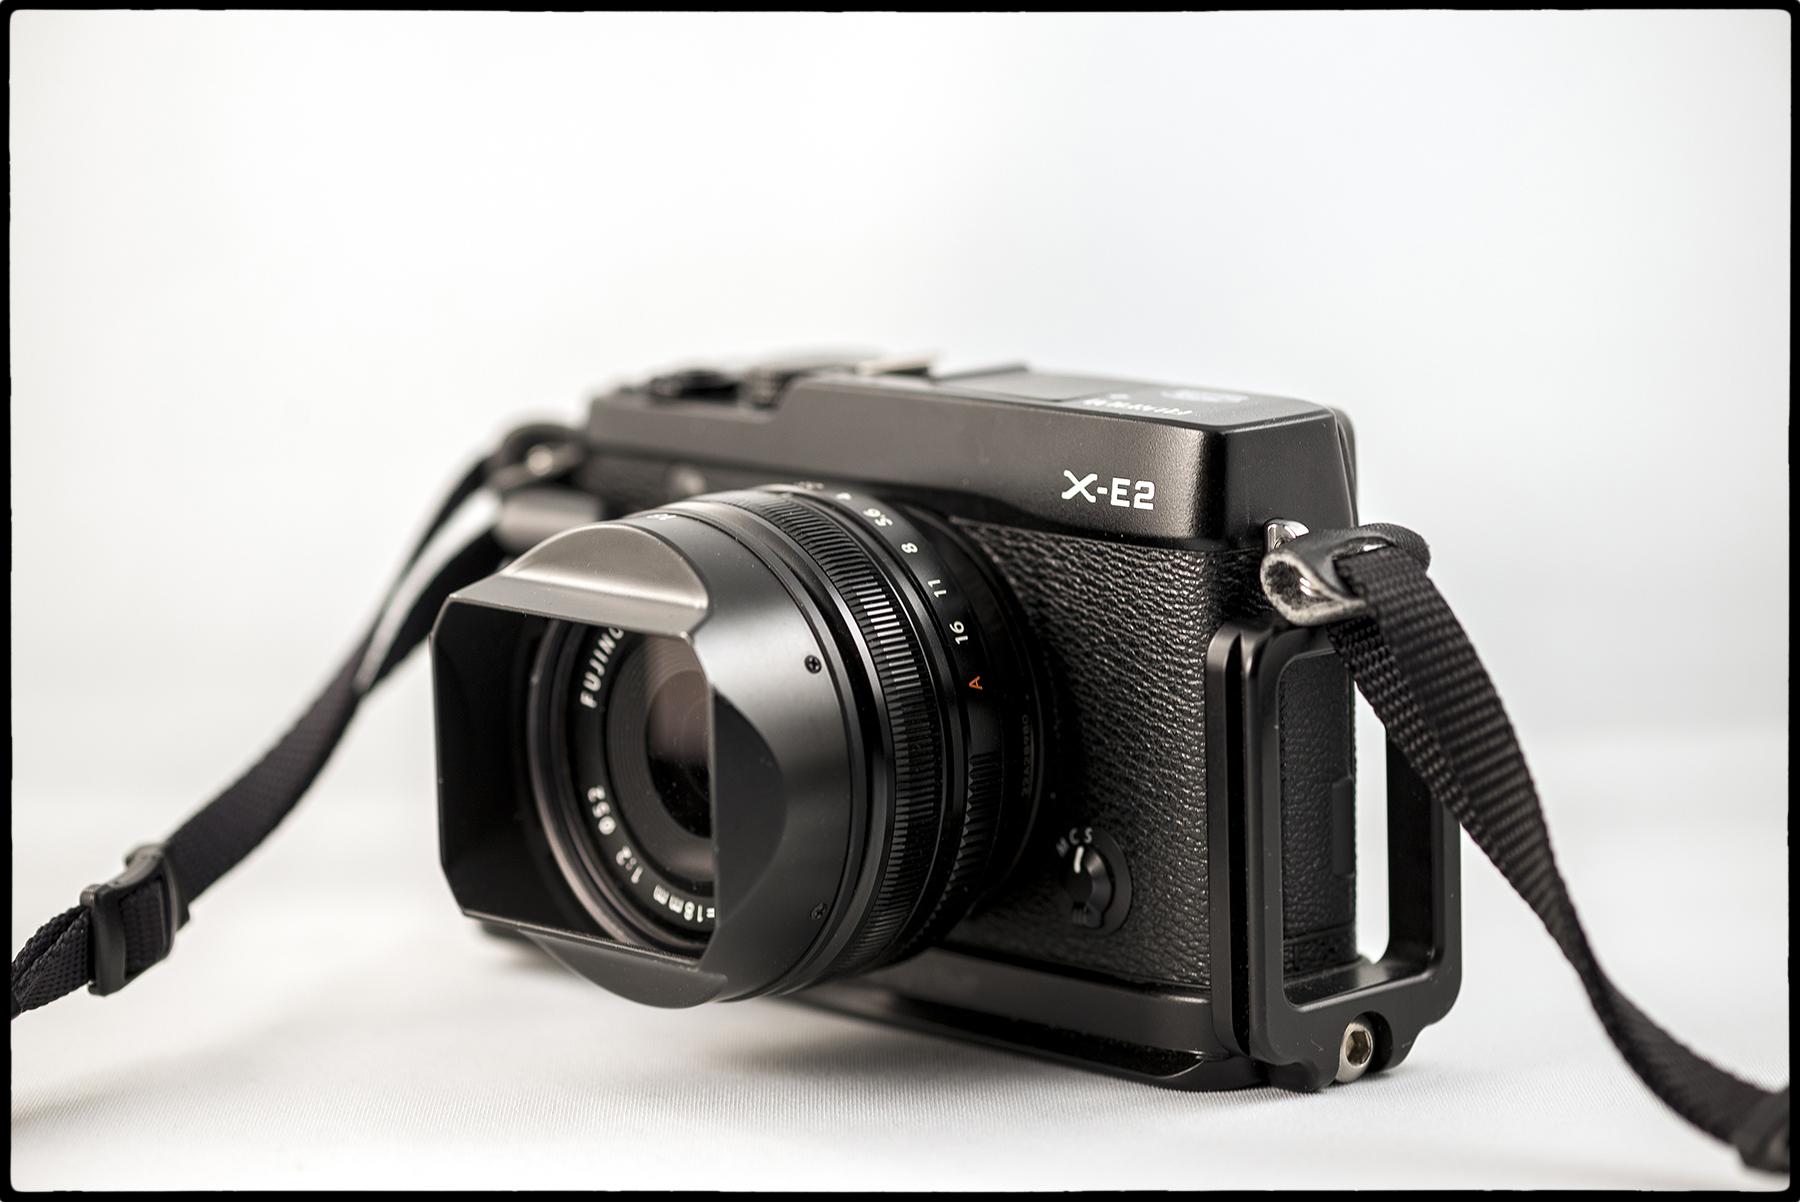 Fuji 18 F2 Lens Opinions Fujifilm X System Slr Talk Forum Fujinon Xf18mm F 20 R View Original Size